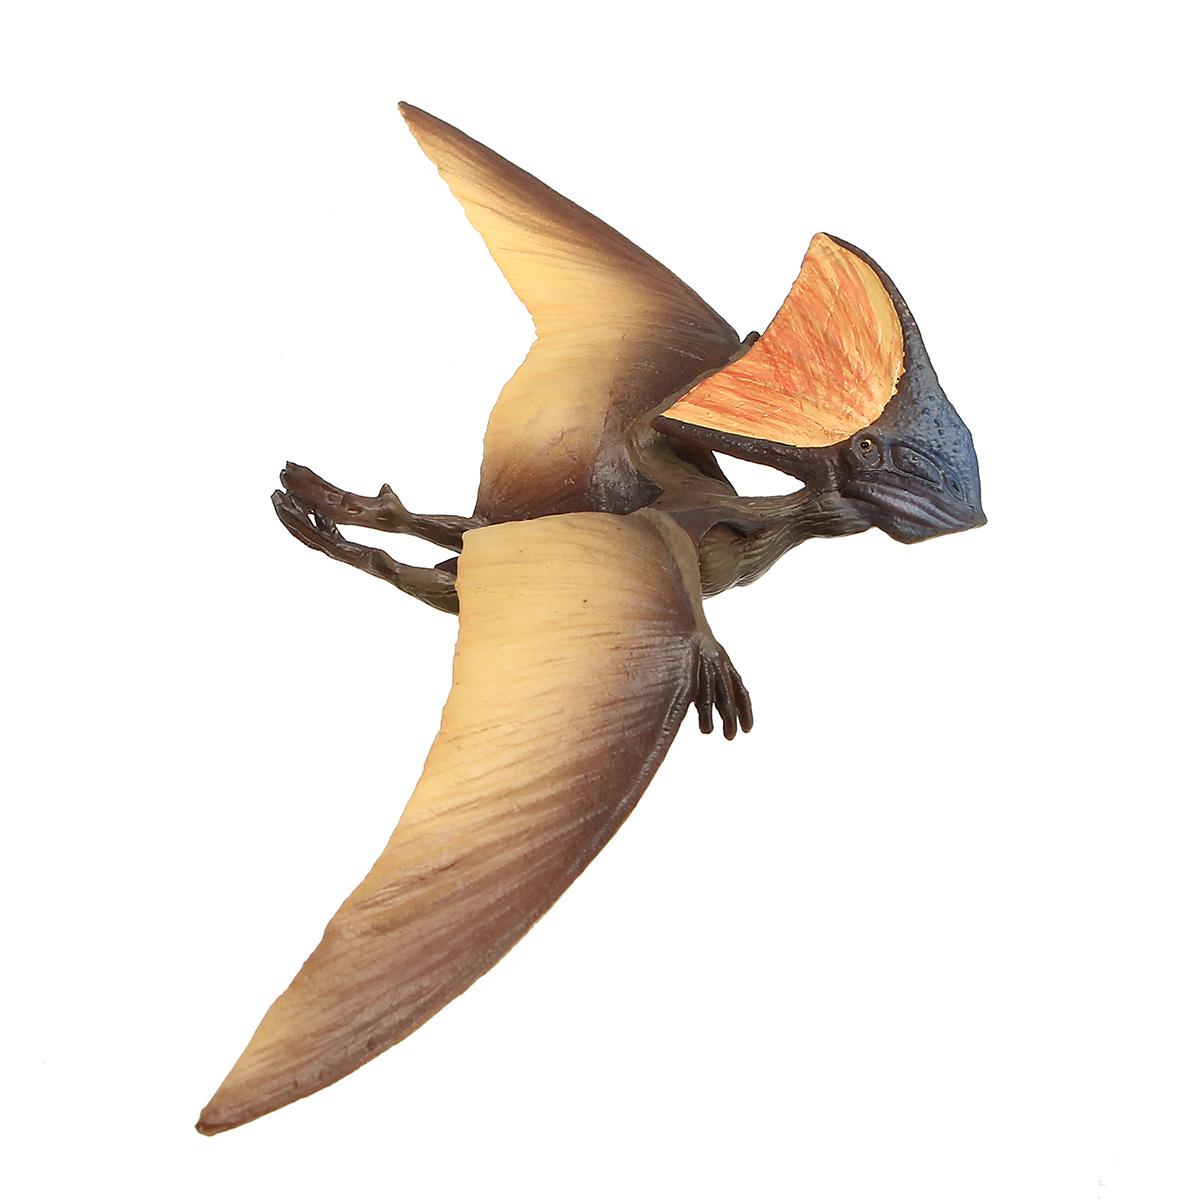 Action Figure Diecast Model Pterosauria Dinosaur Toy Best Gift for Boy Kids Children